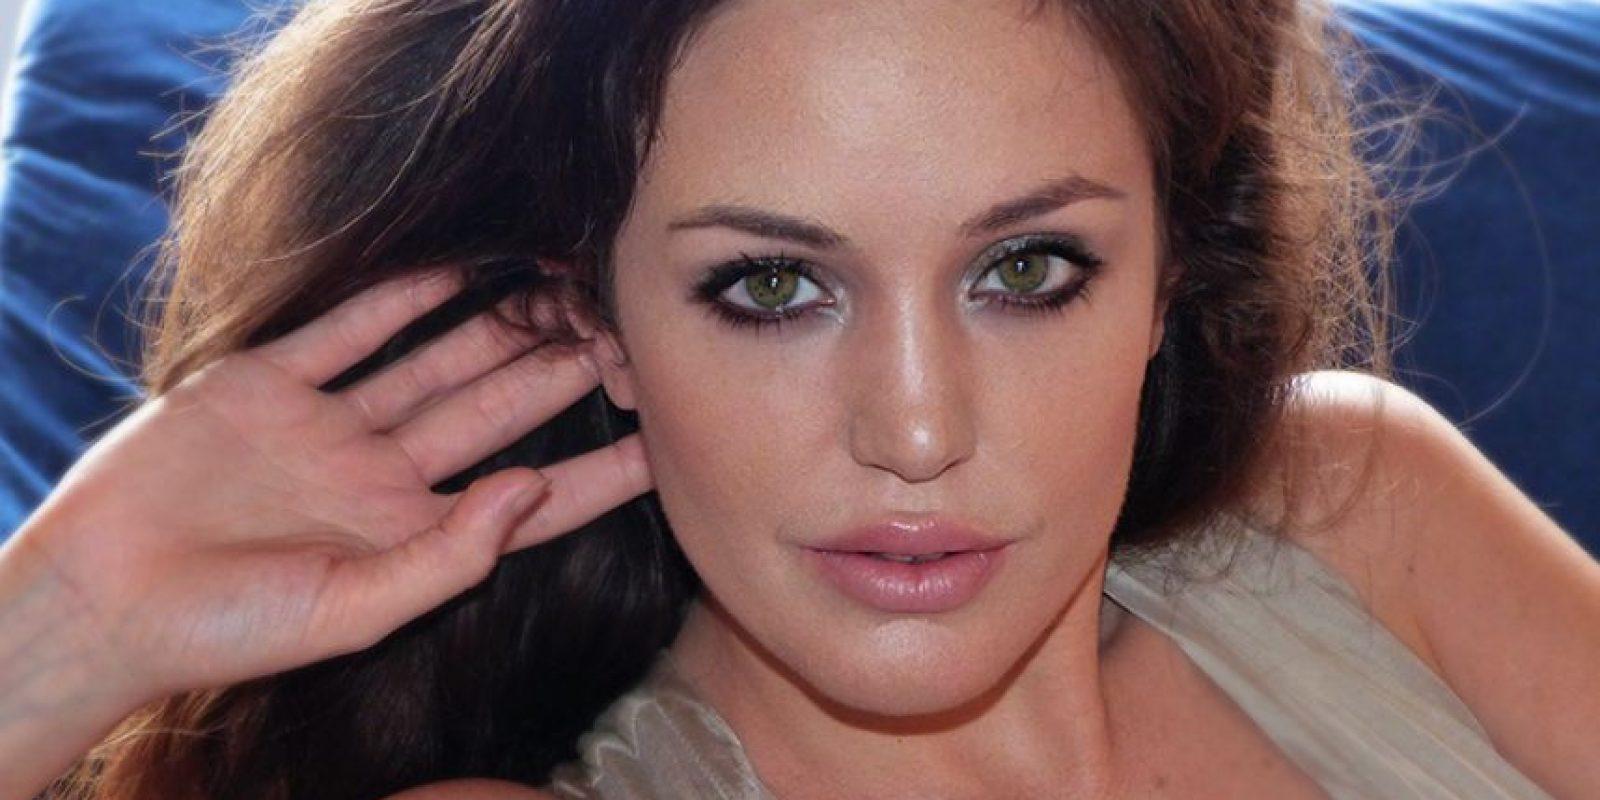 La doble de Angelina Jolie Foto:Facebook/Lina Sands